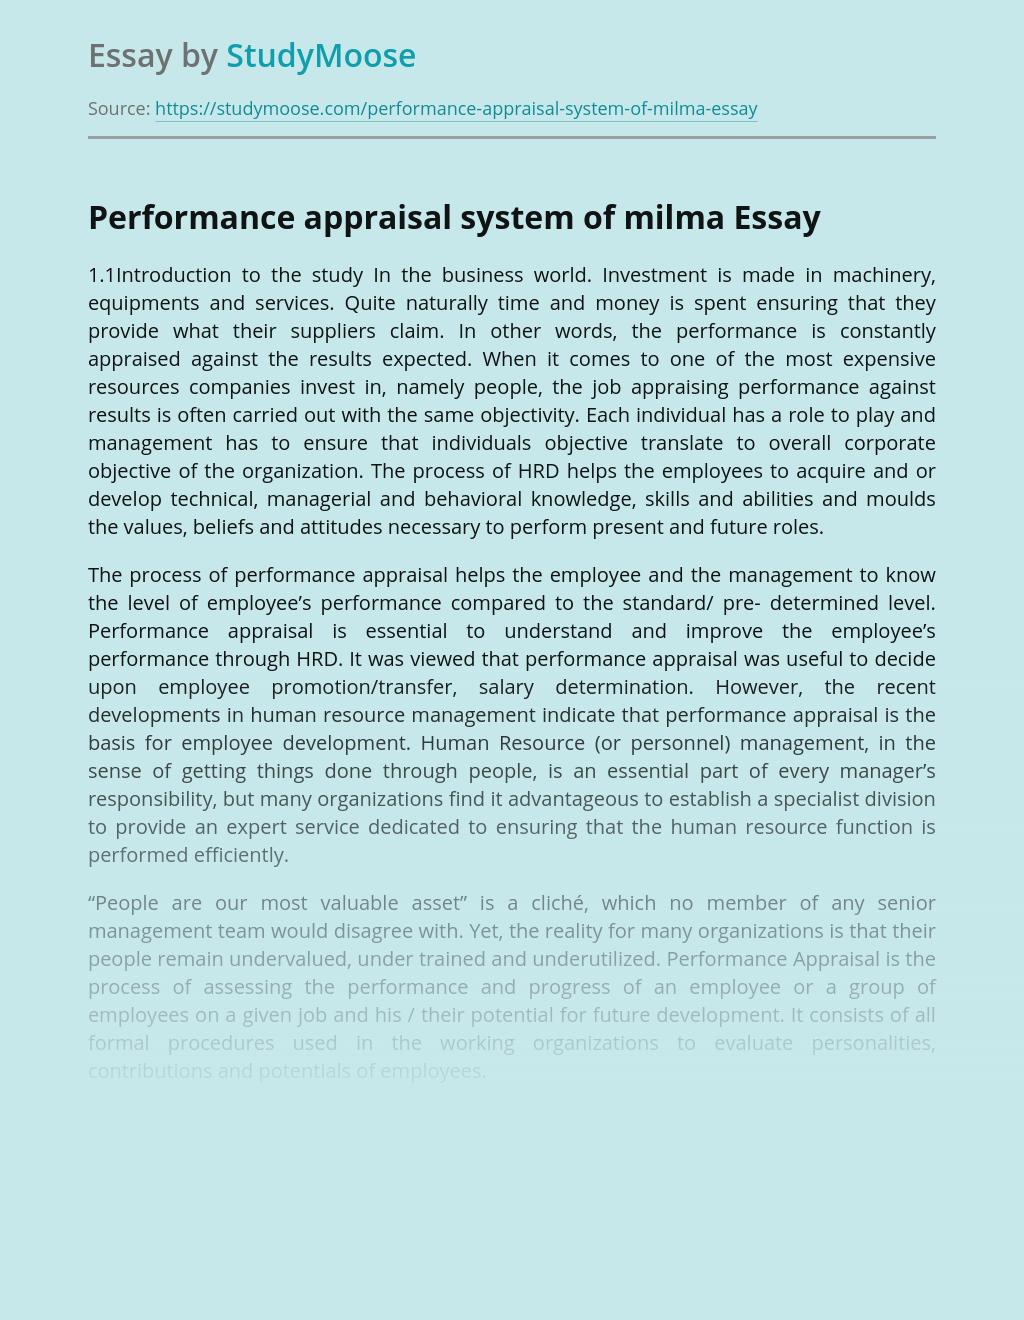 Performance Appraisal System of Milma